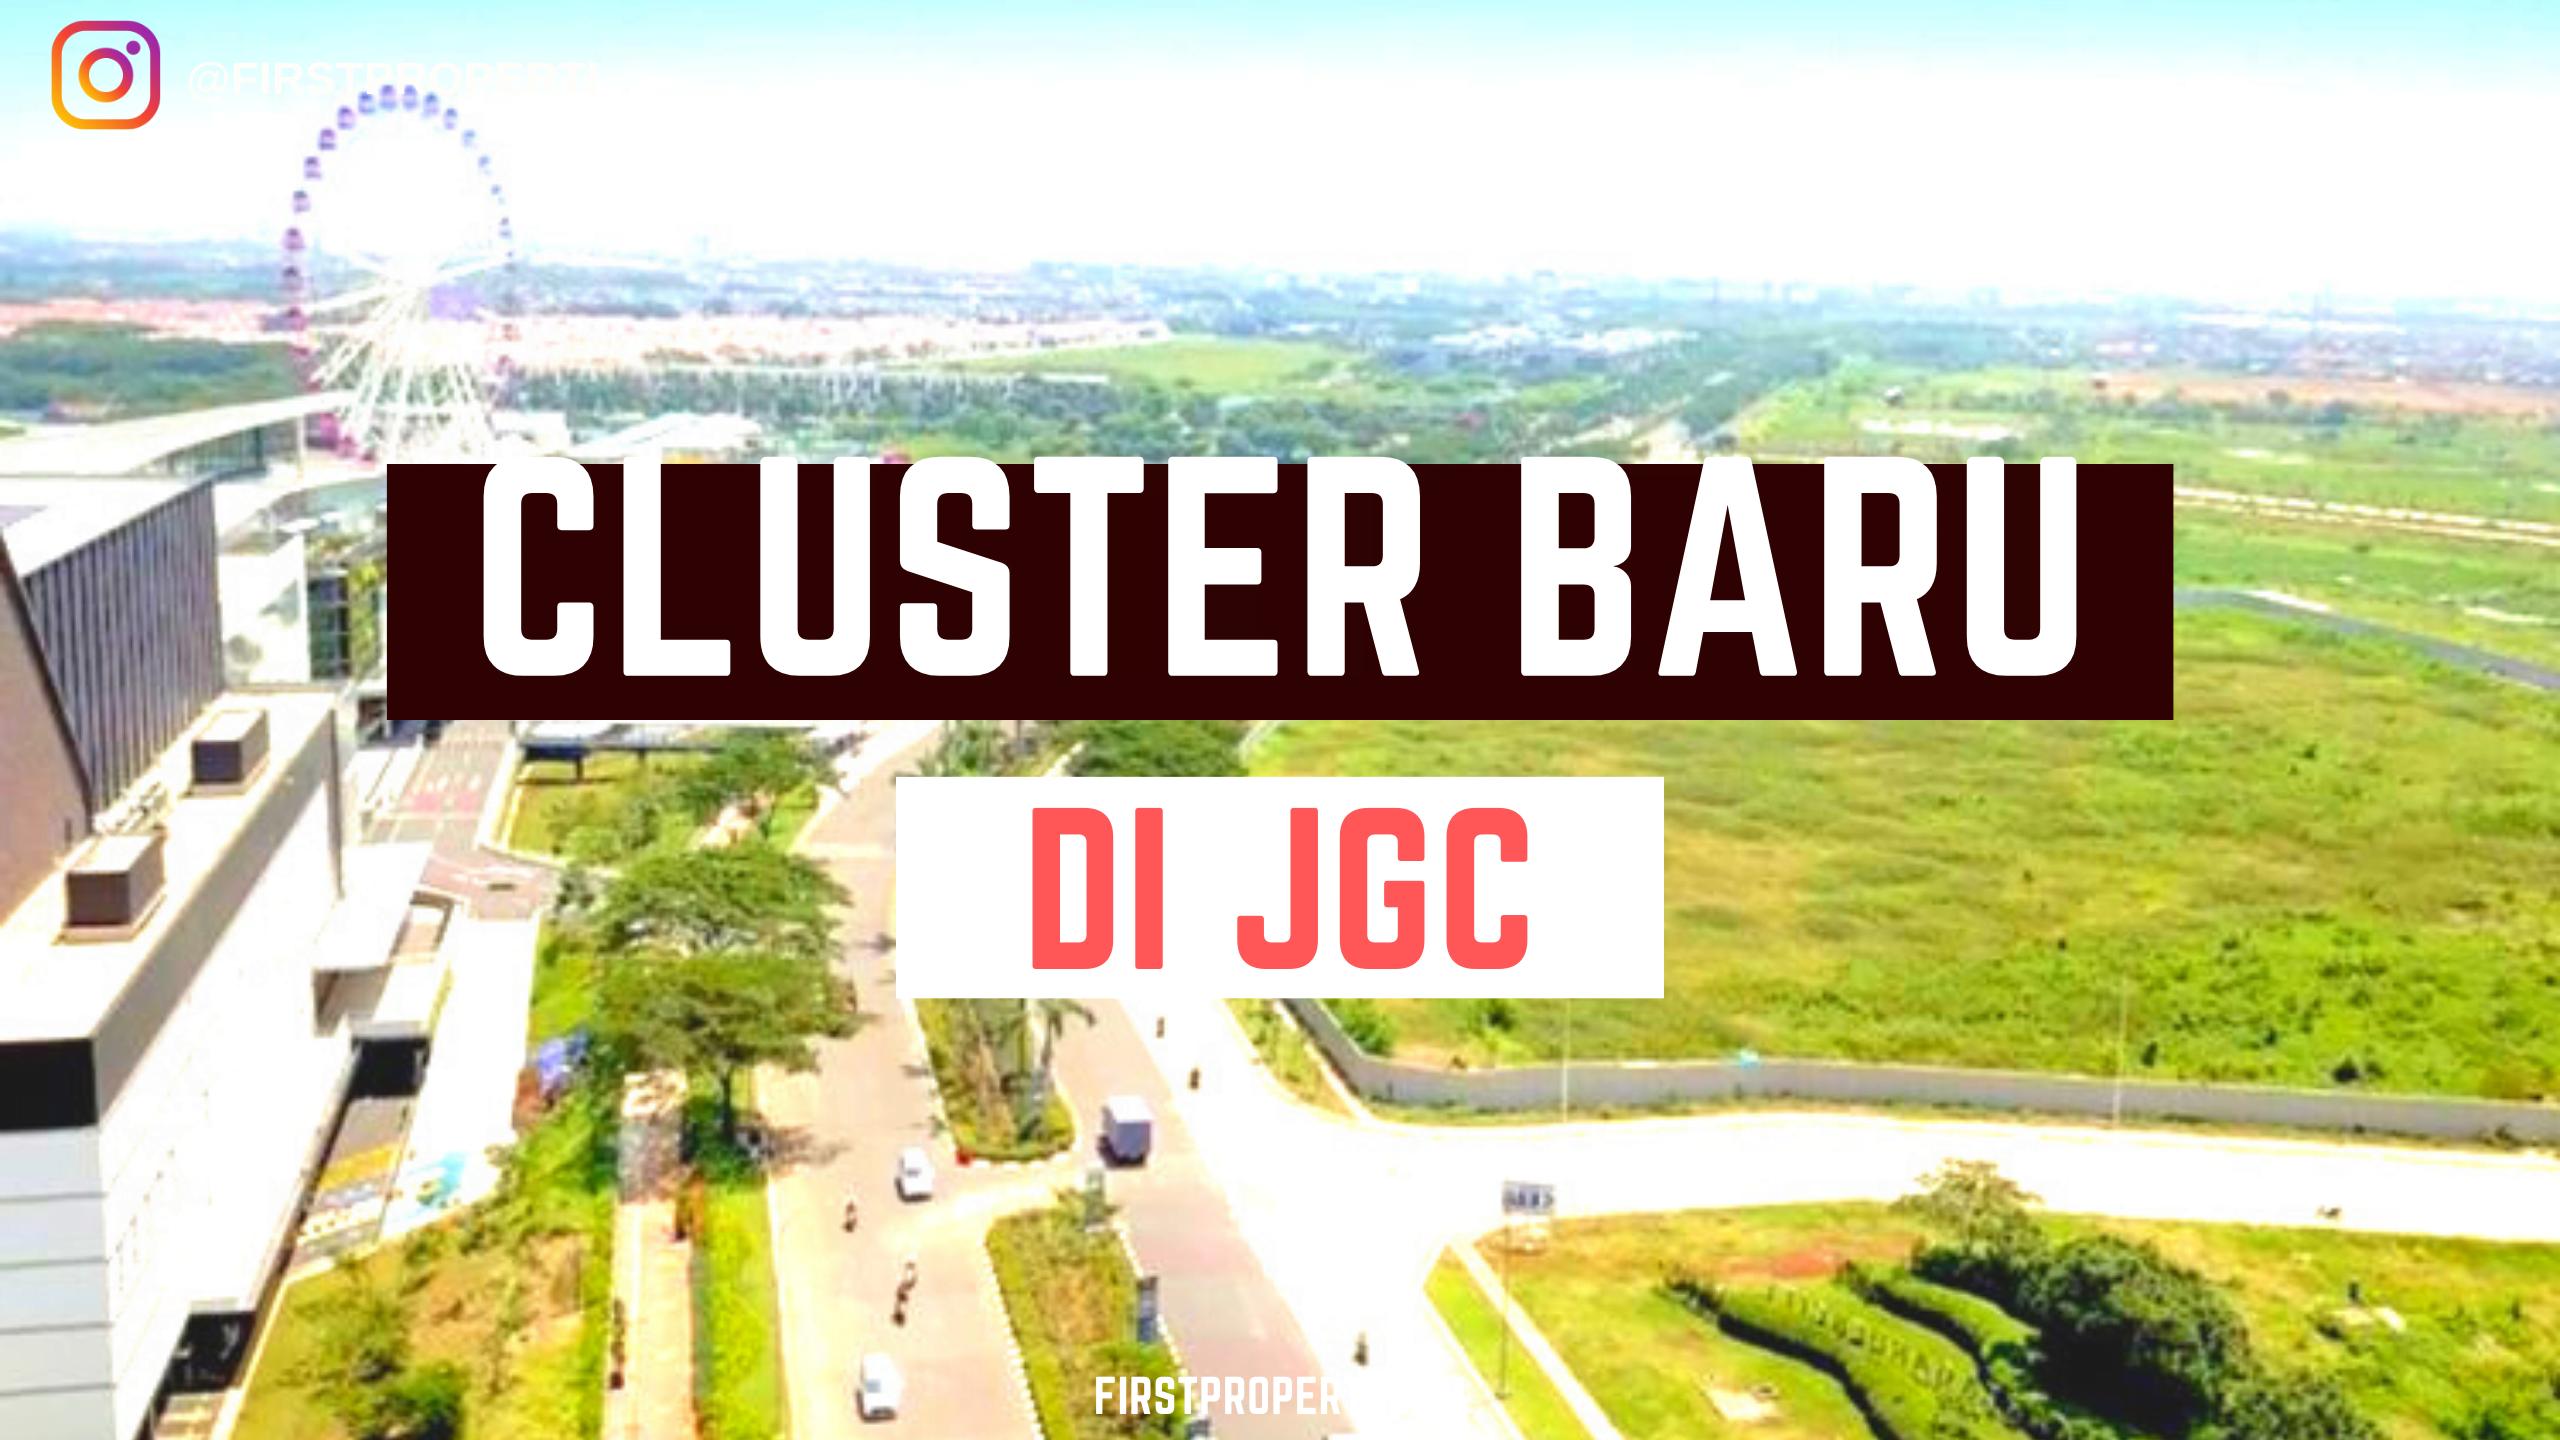 cluster baru jgc